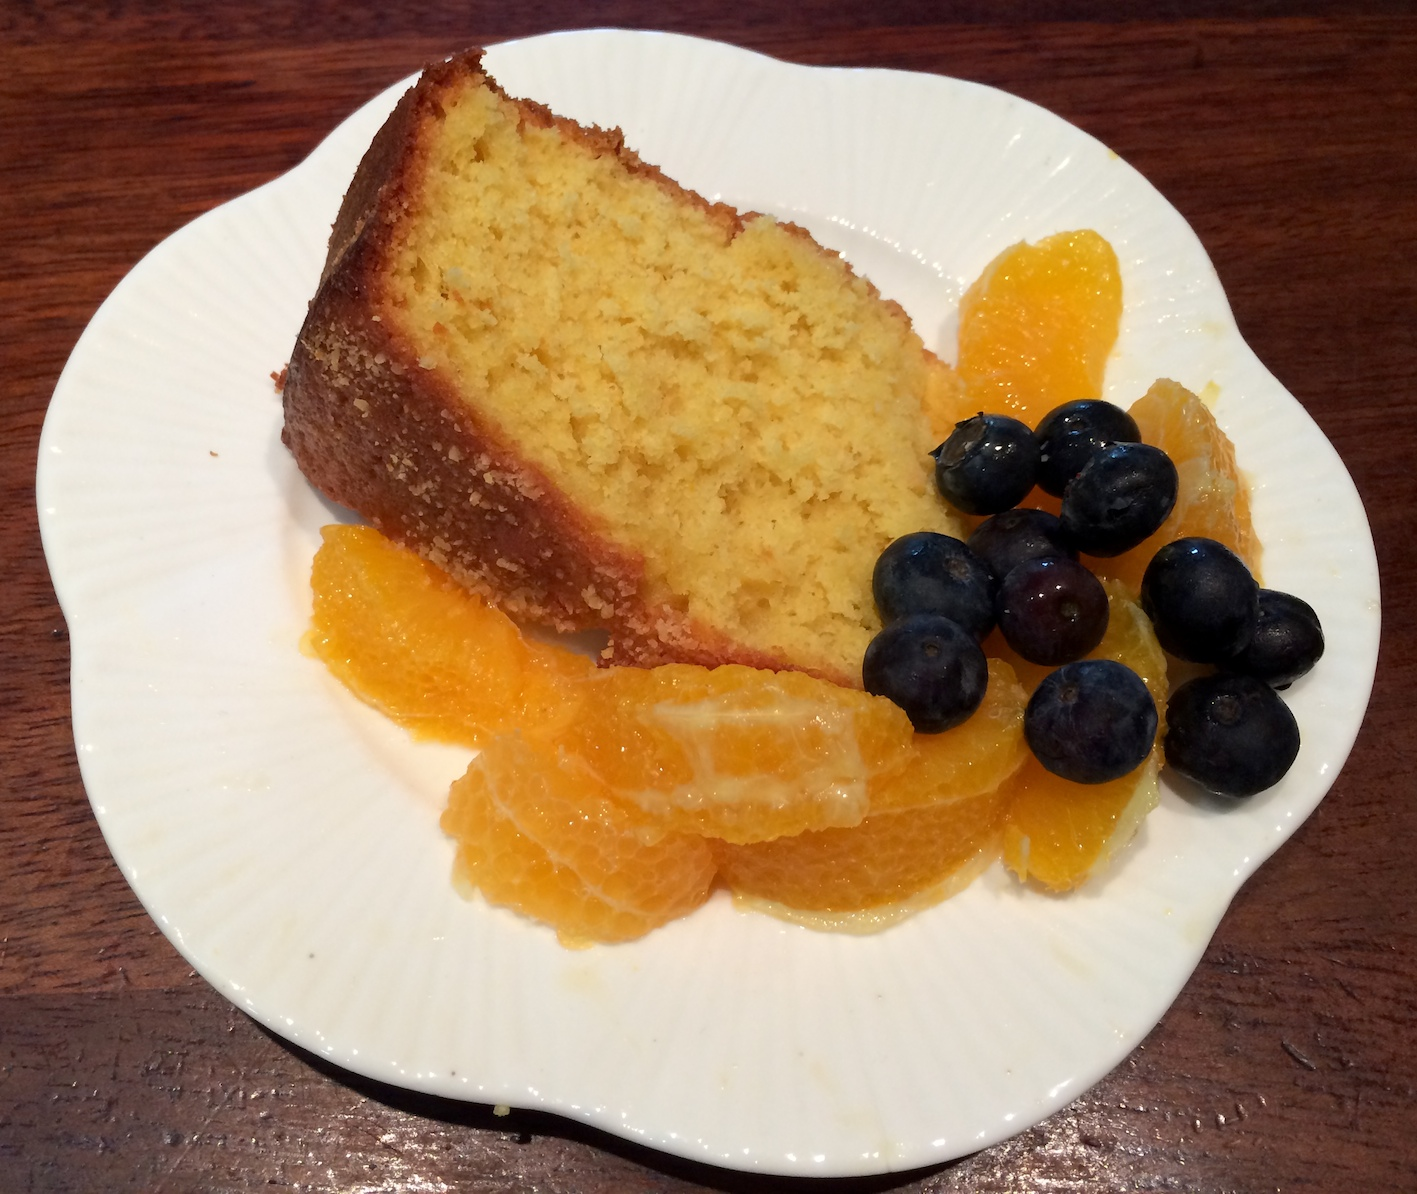 Orange yoghurt cake with fruit